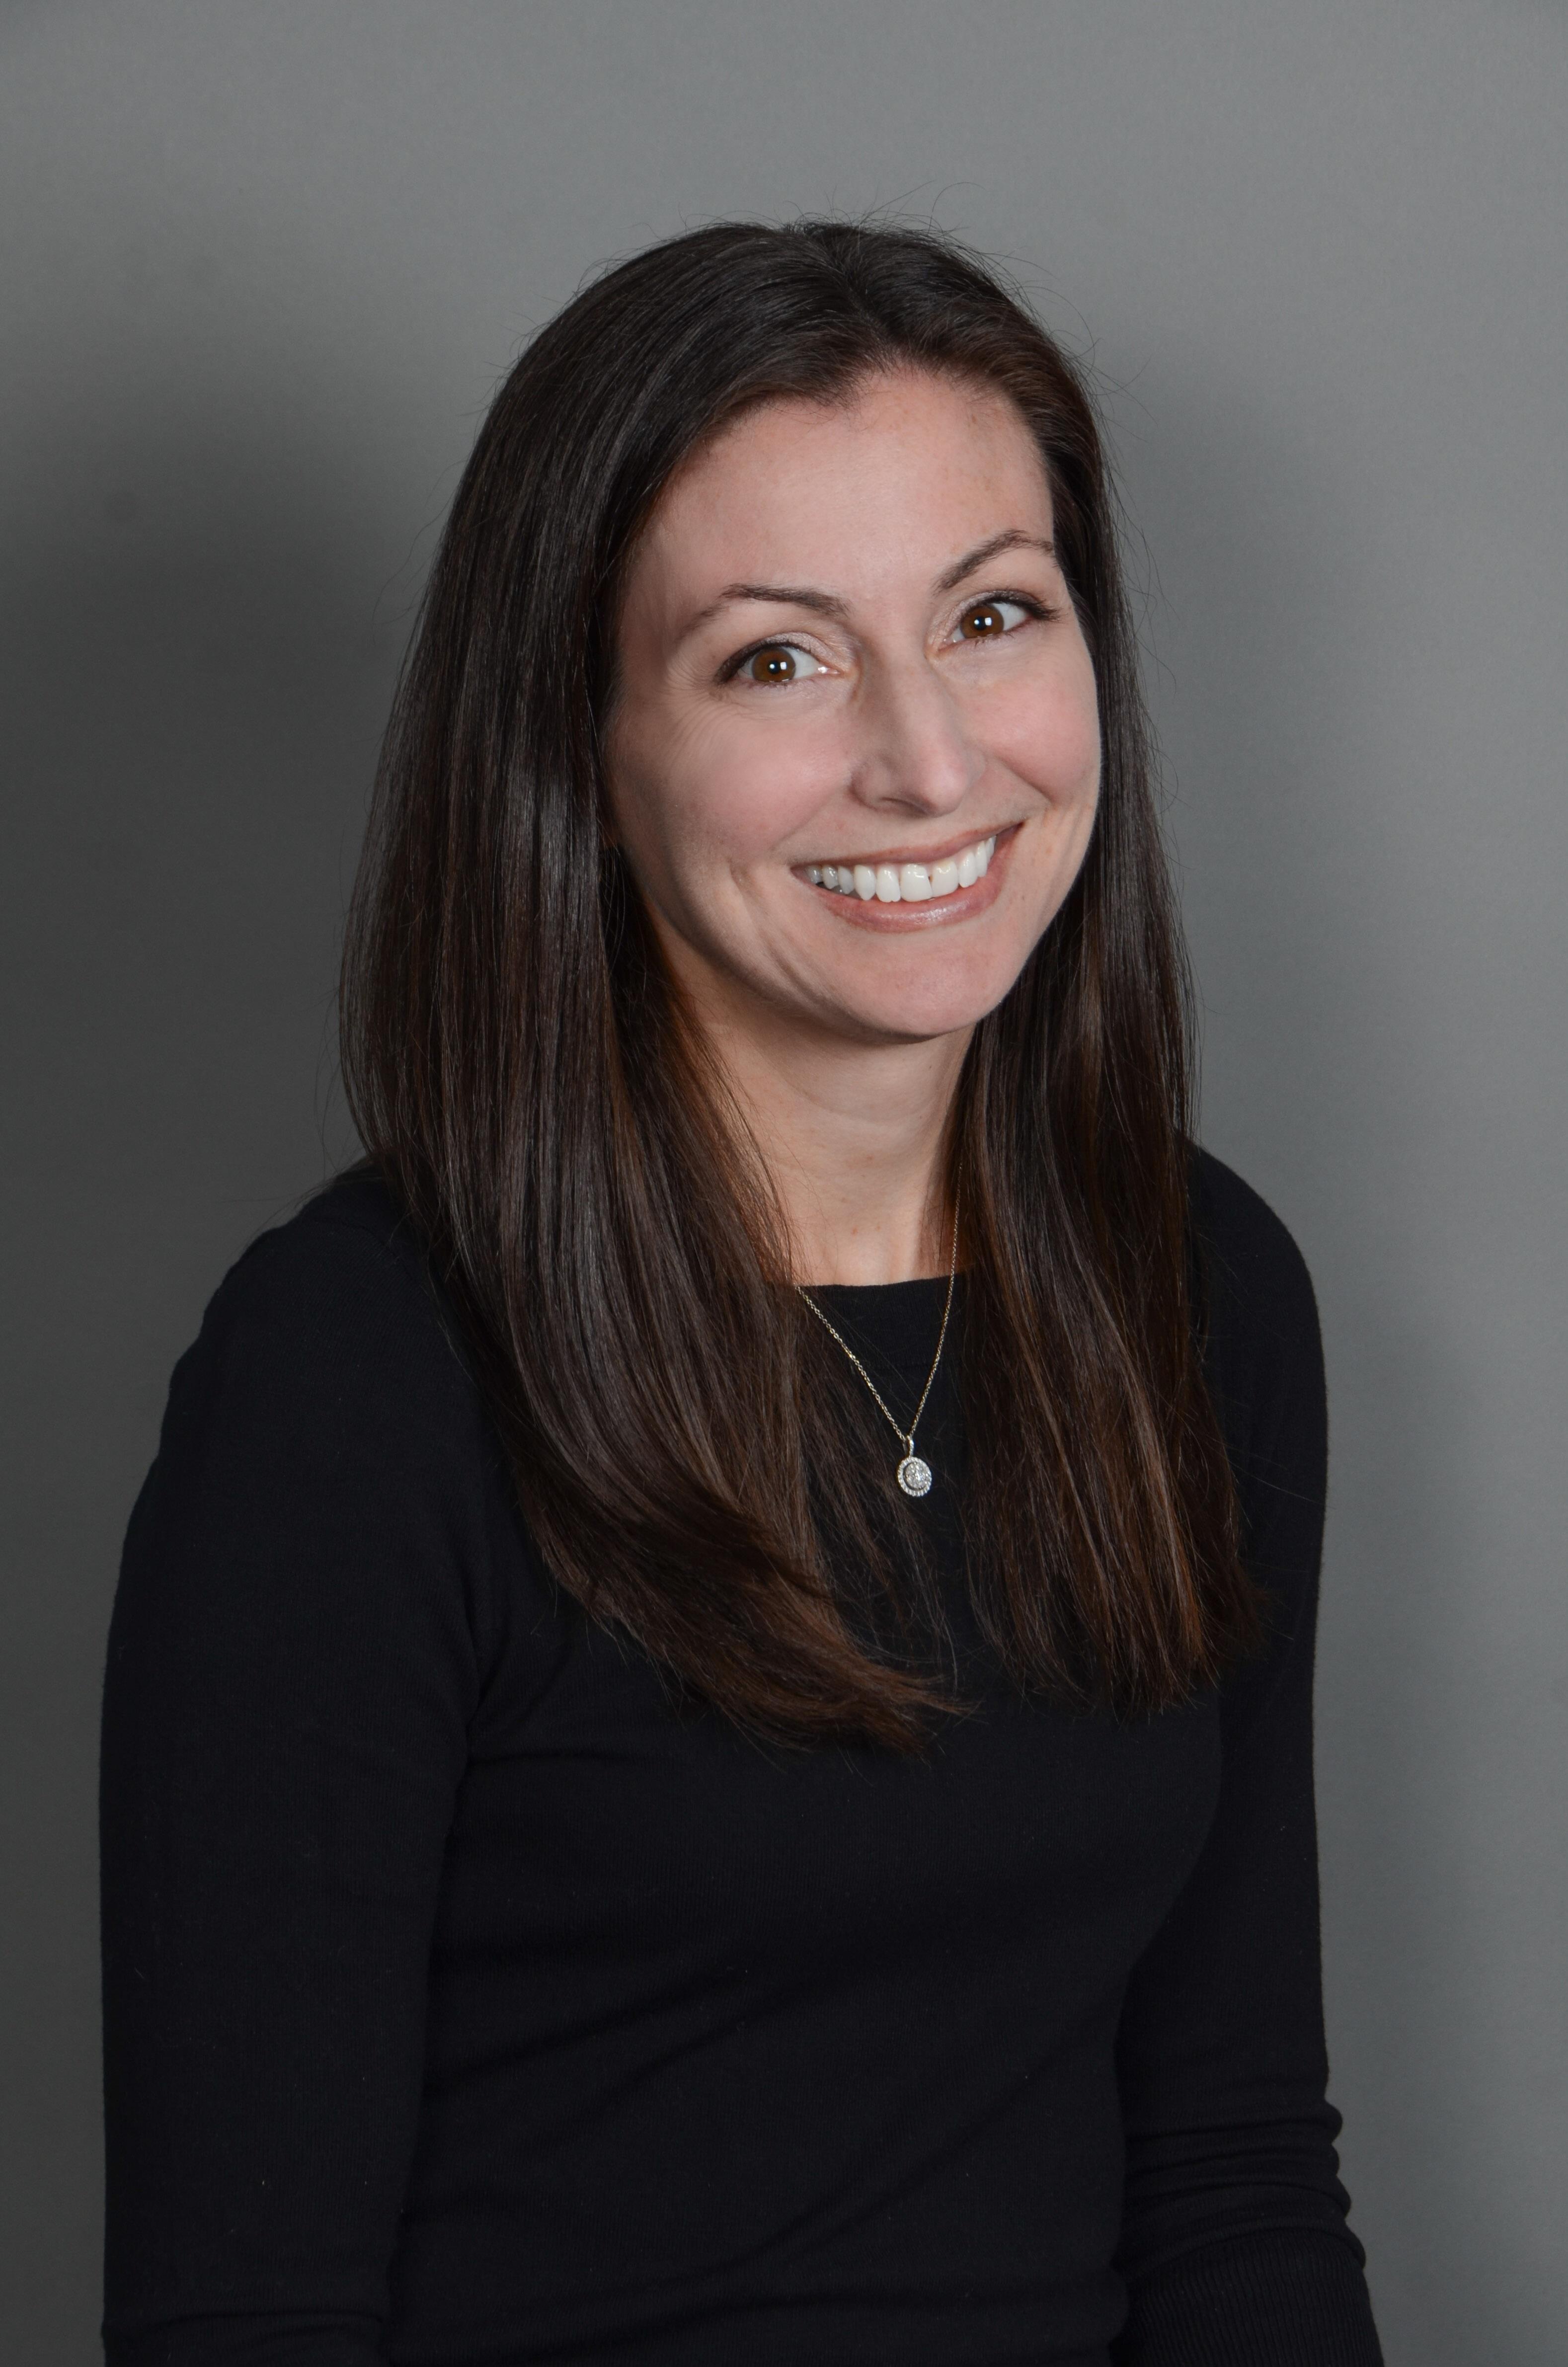 Melissa Famiglietti